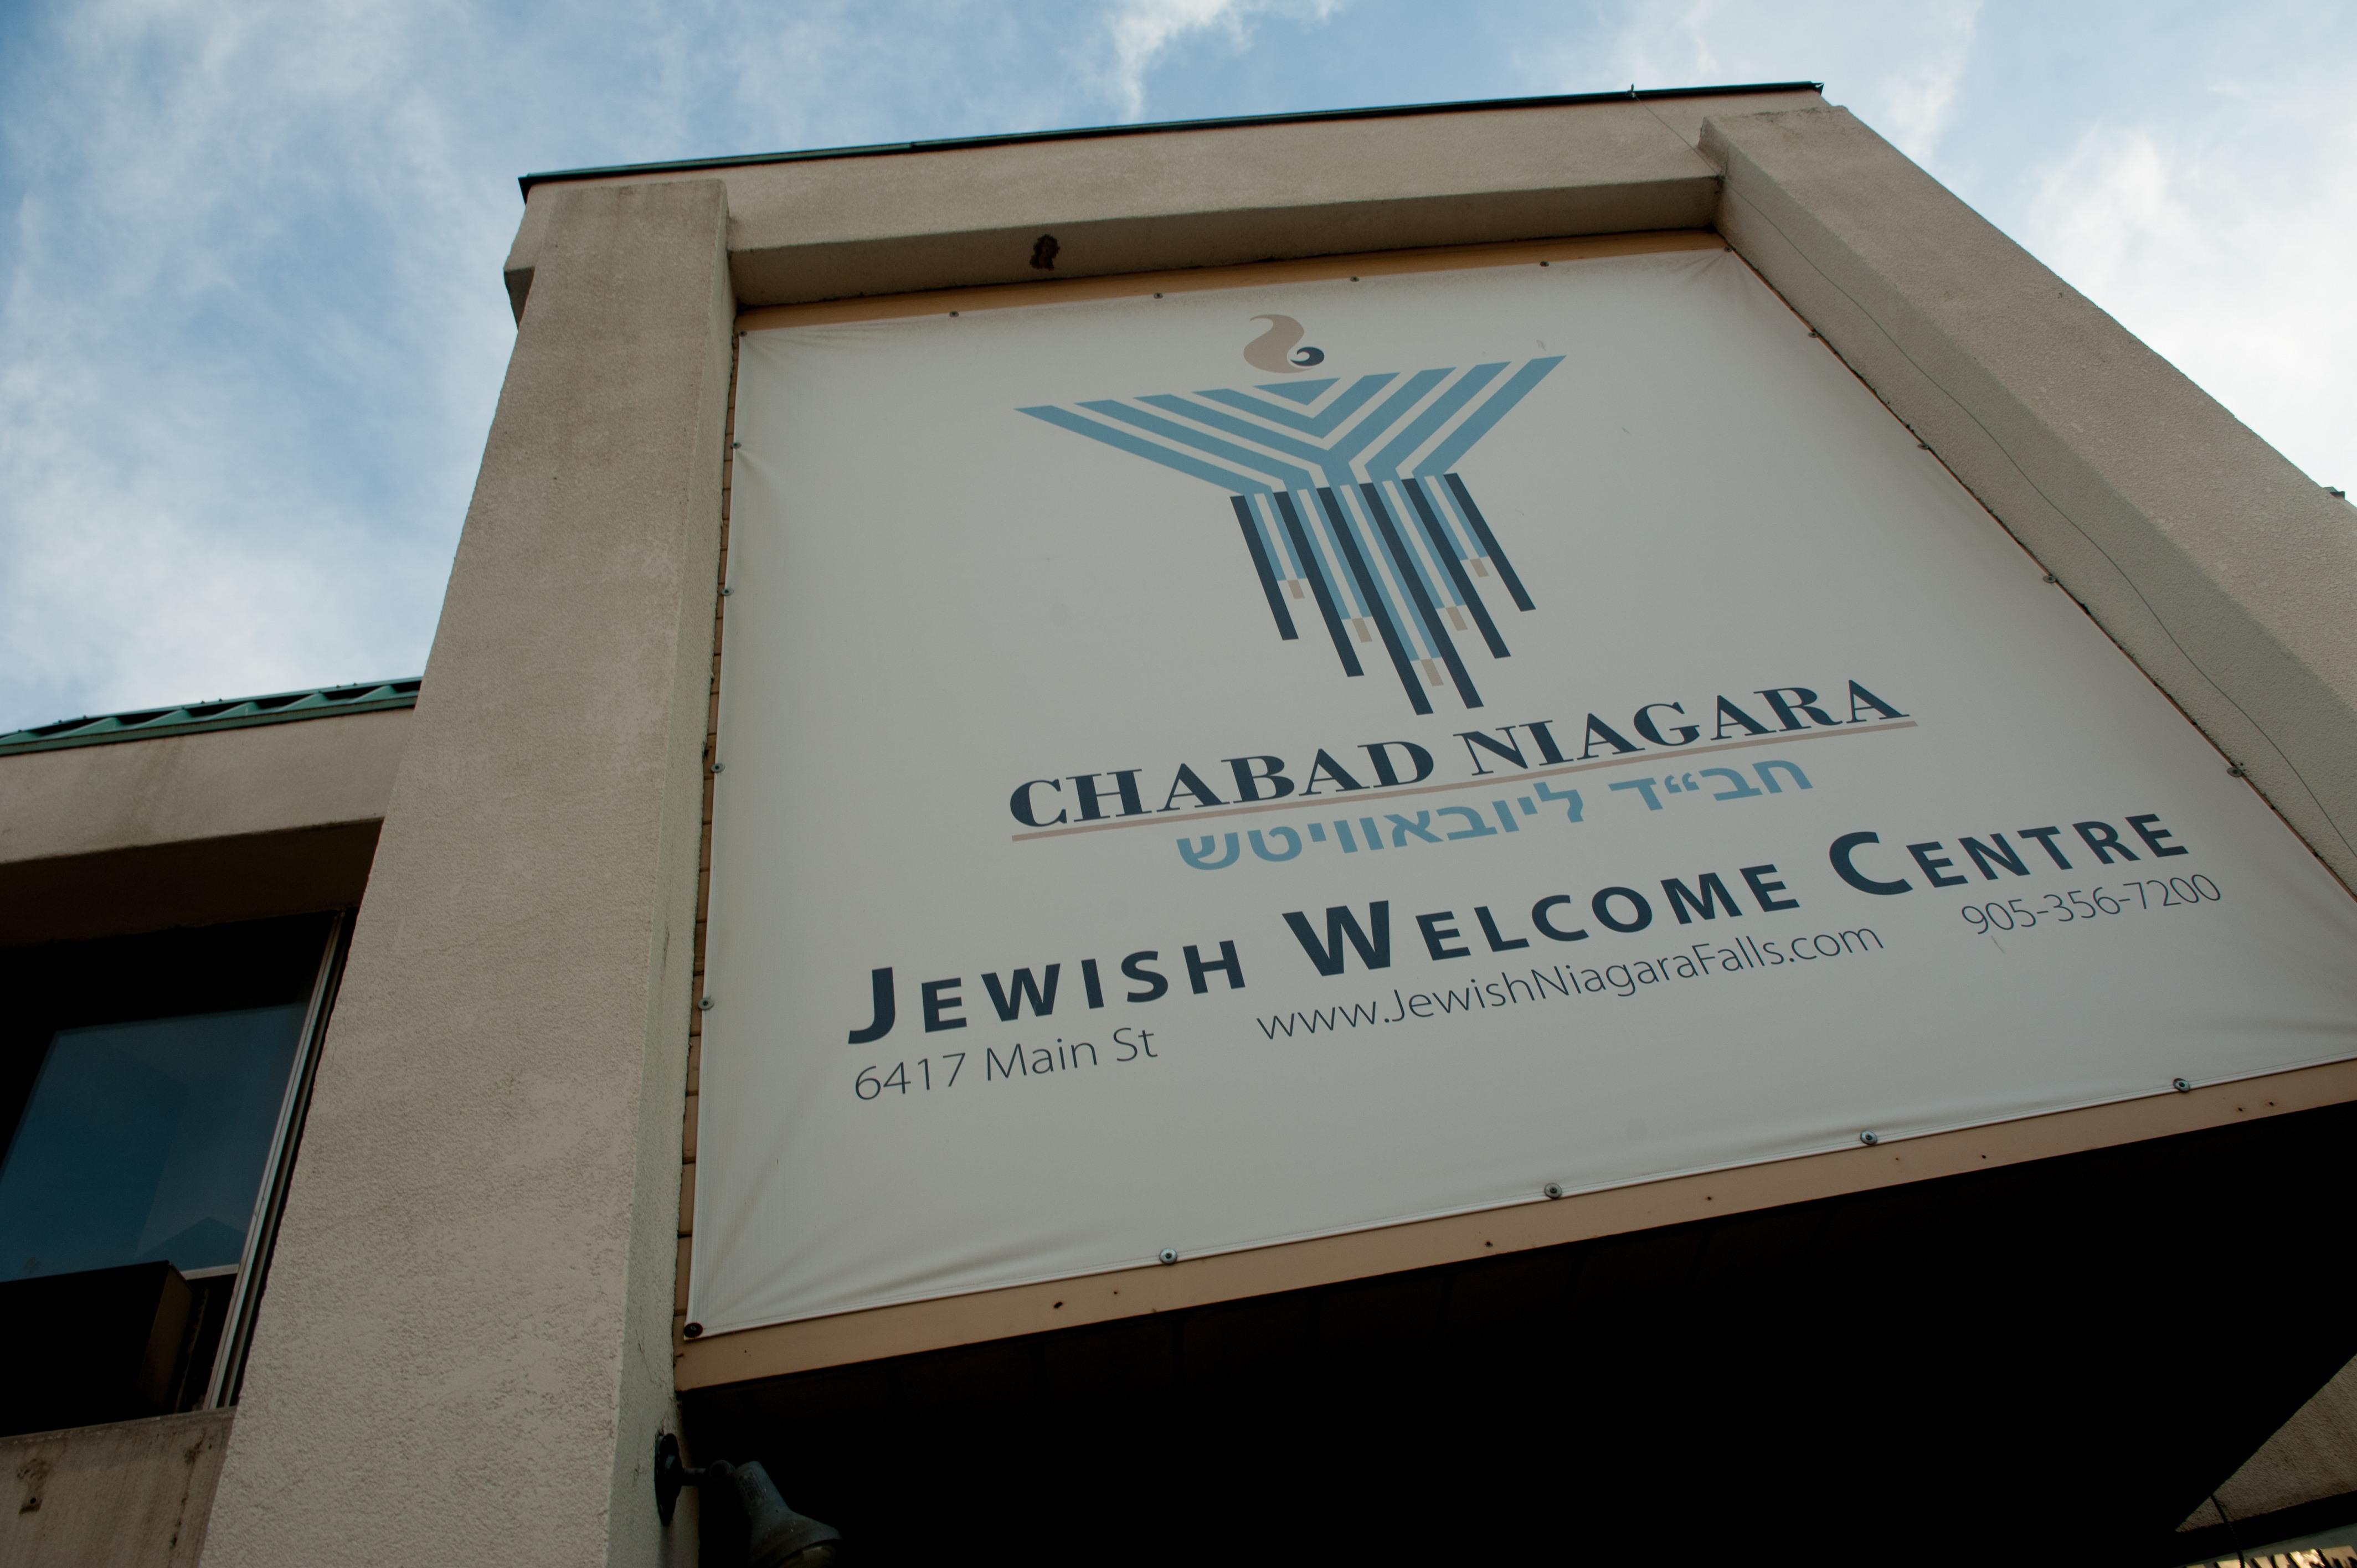 Chabad Jewish Welcome Center